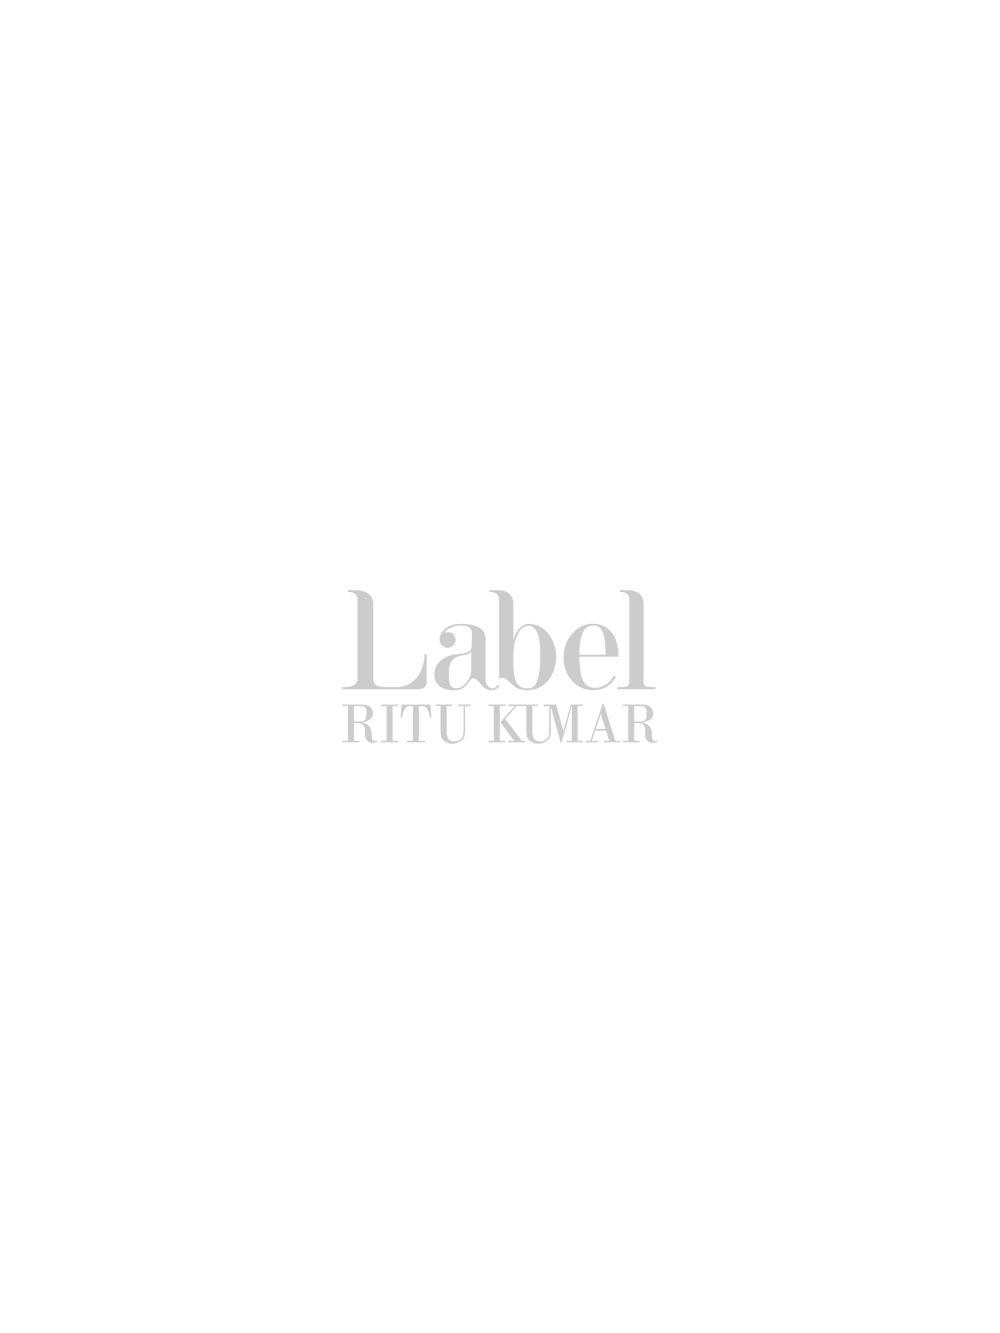 Sky Blue Tiered Dress by Label Ritu Kumar